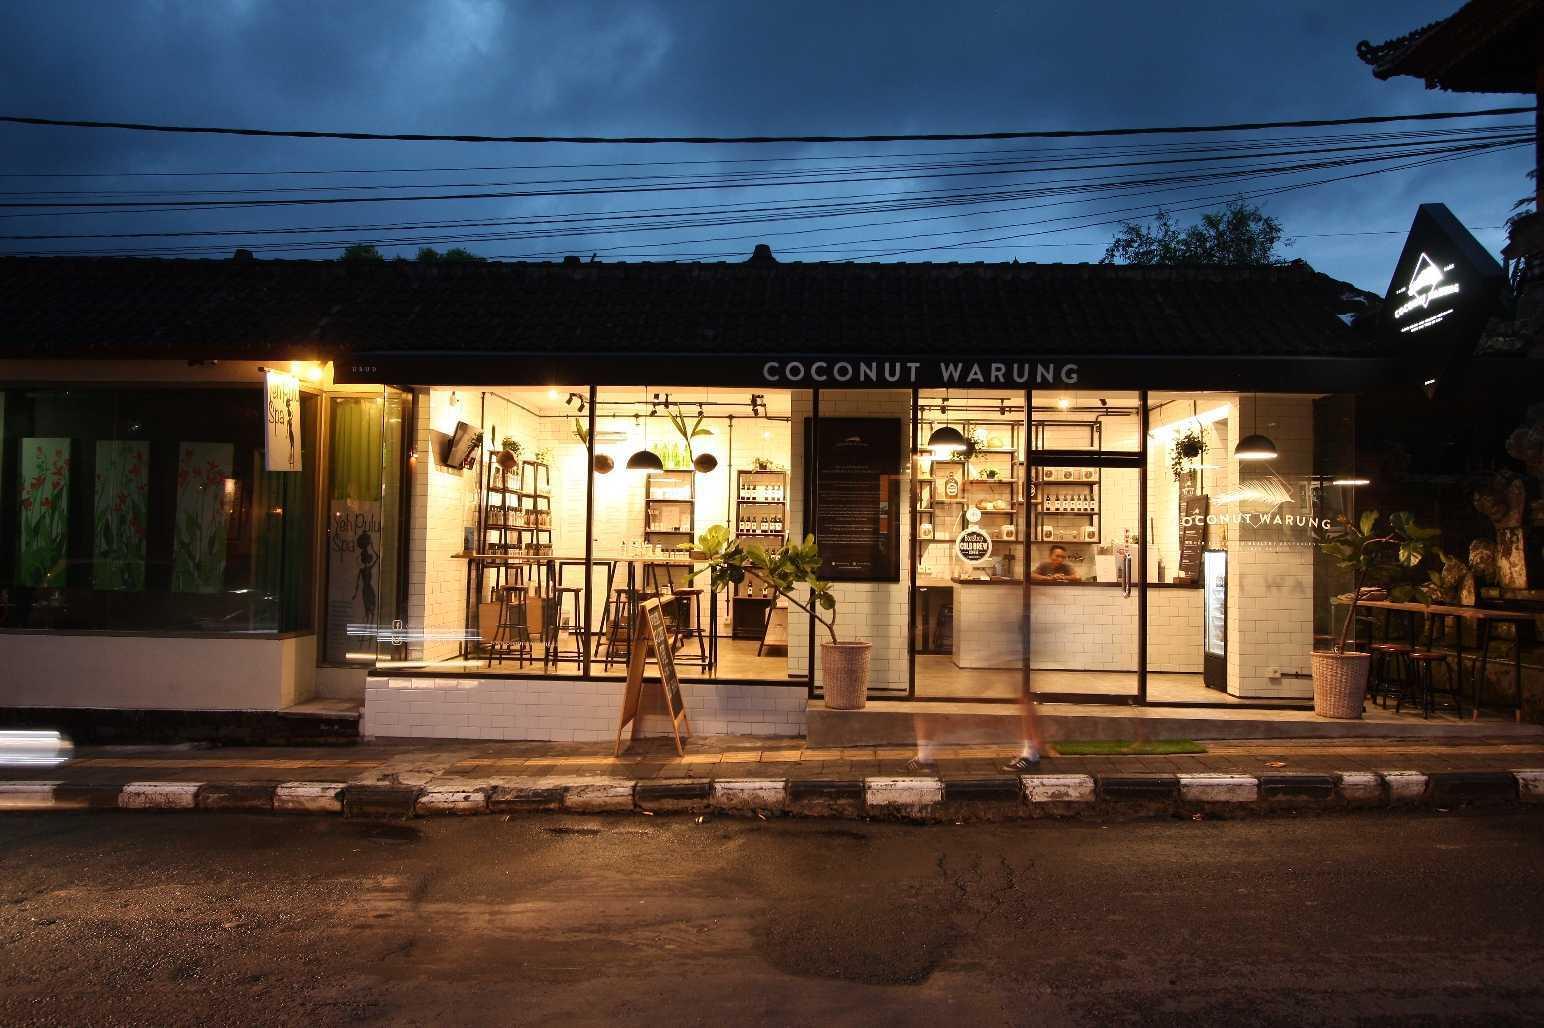 Ddap Architect Coconut Warung Shop & Cafe Ubud, Kabupaten Gianyar, Bali, Indonesia Bali Img0822 Industrial  28552